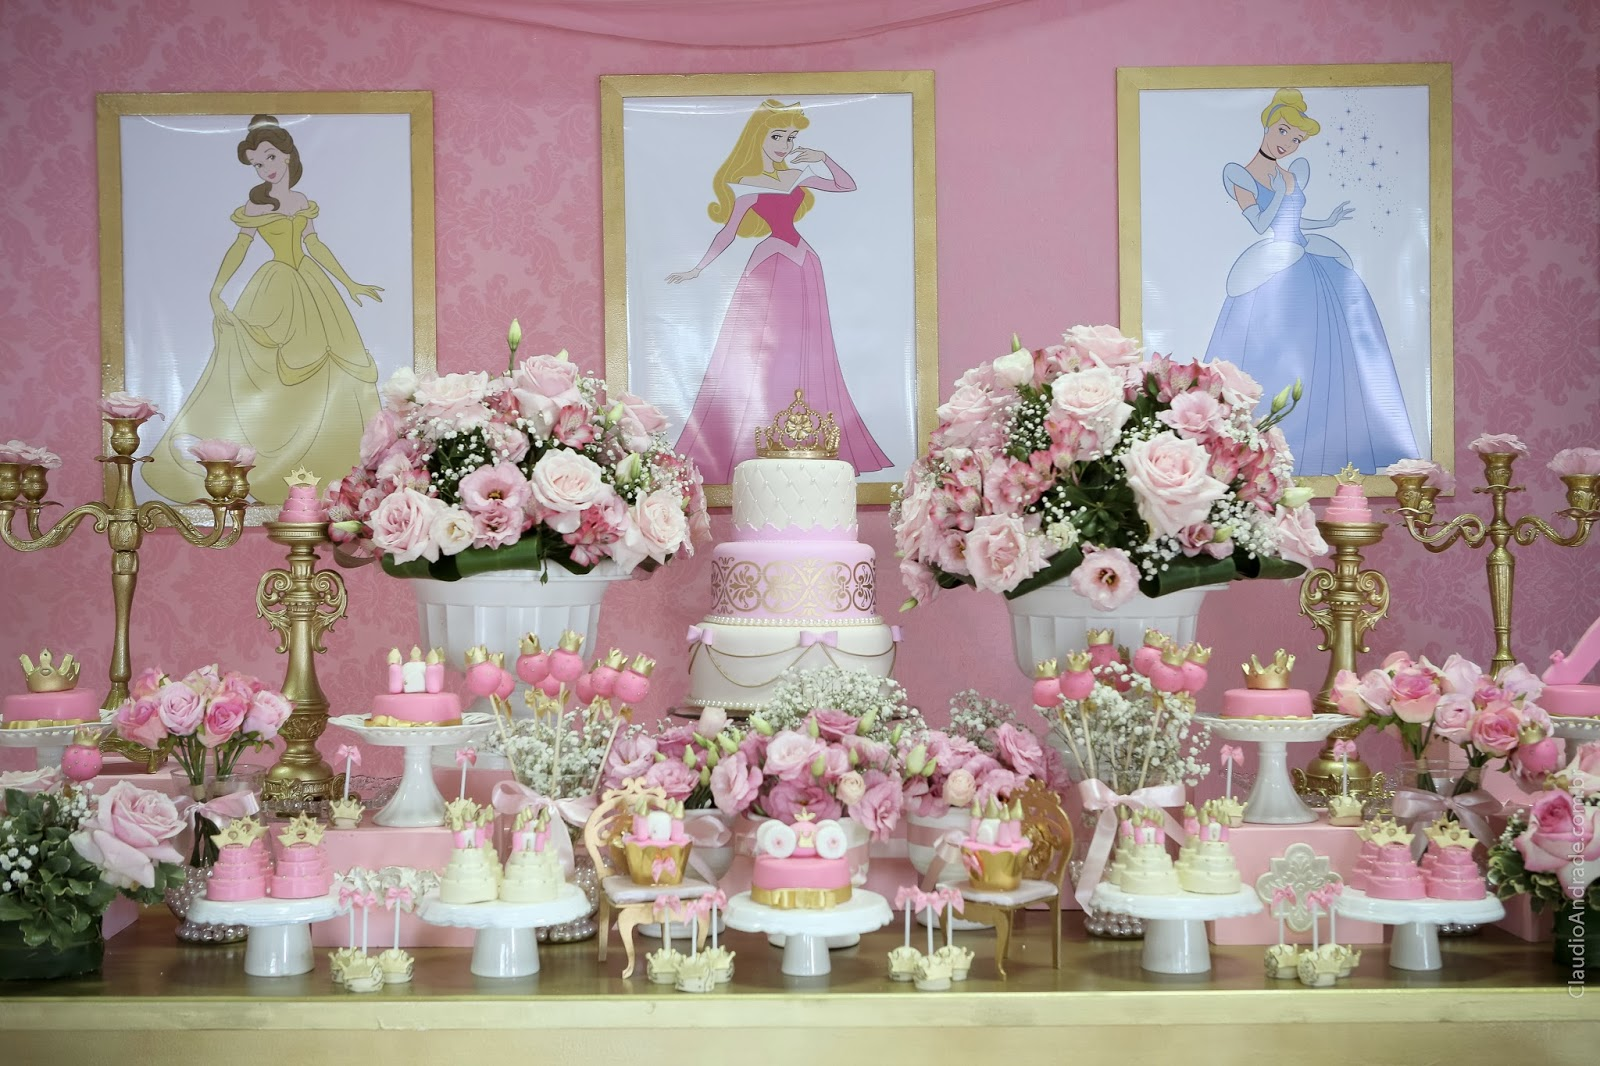 festa jardim da princesa : festa jardim da princesa:Festa Provençal – Site Oficial: O Castelo da Luiza!!